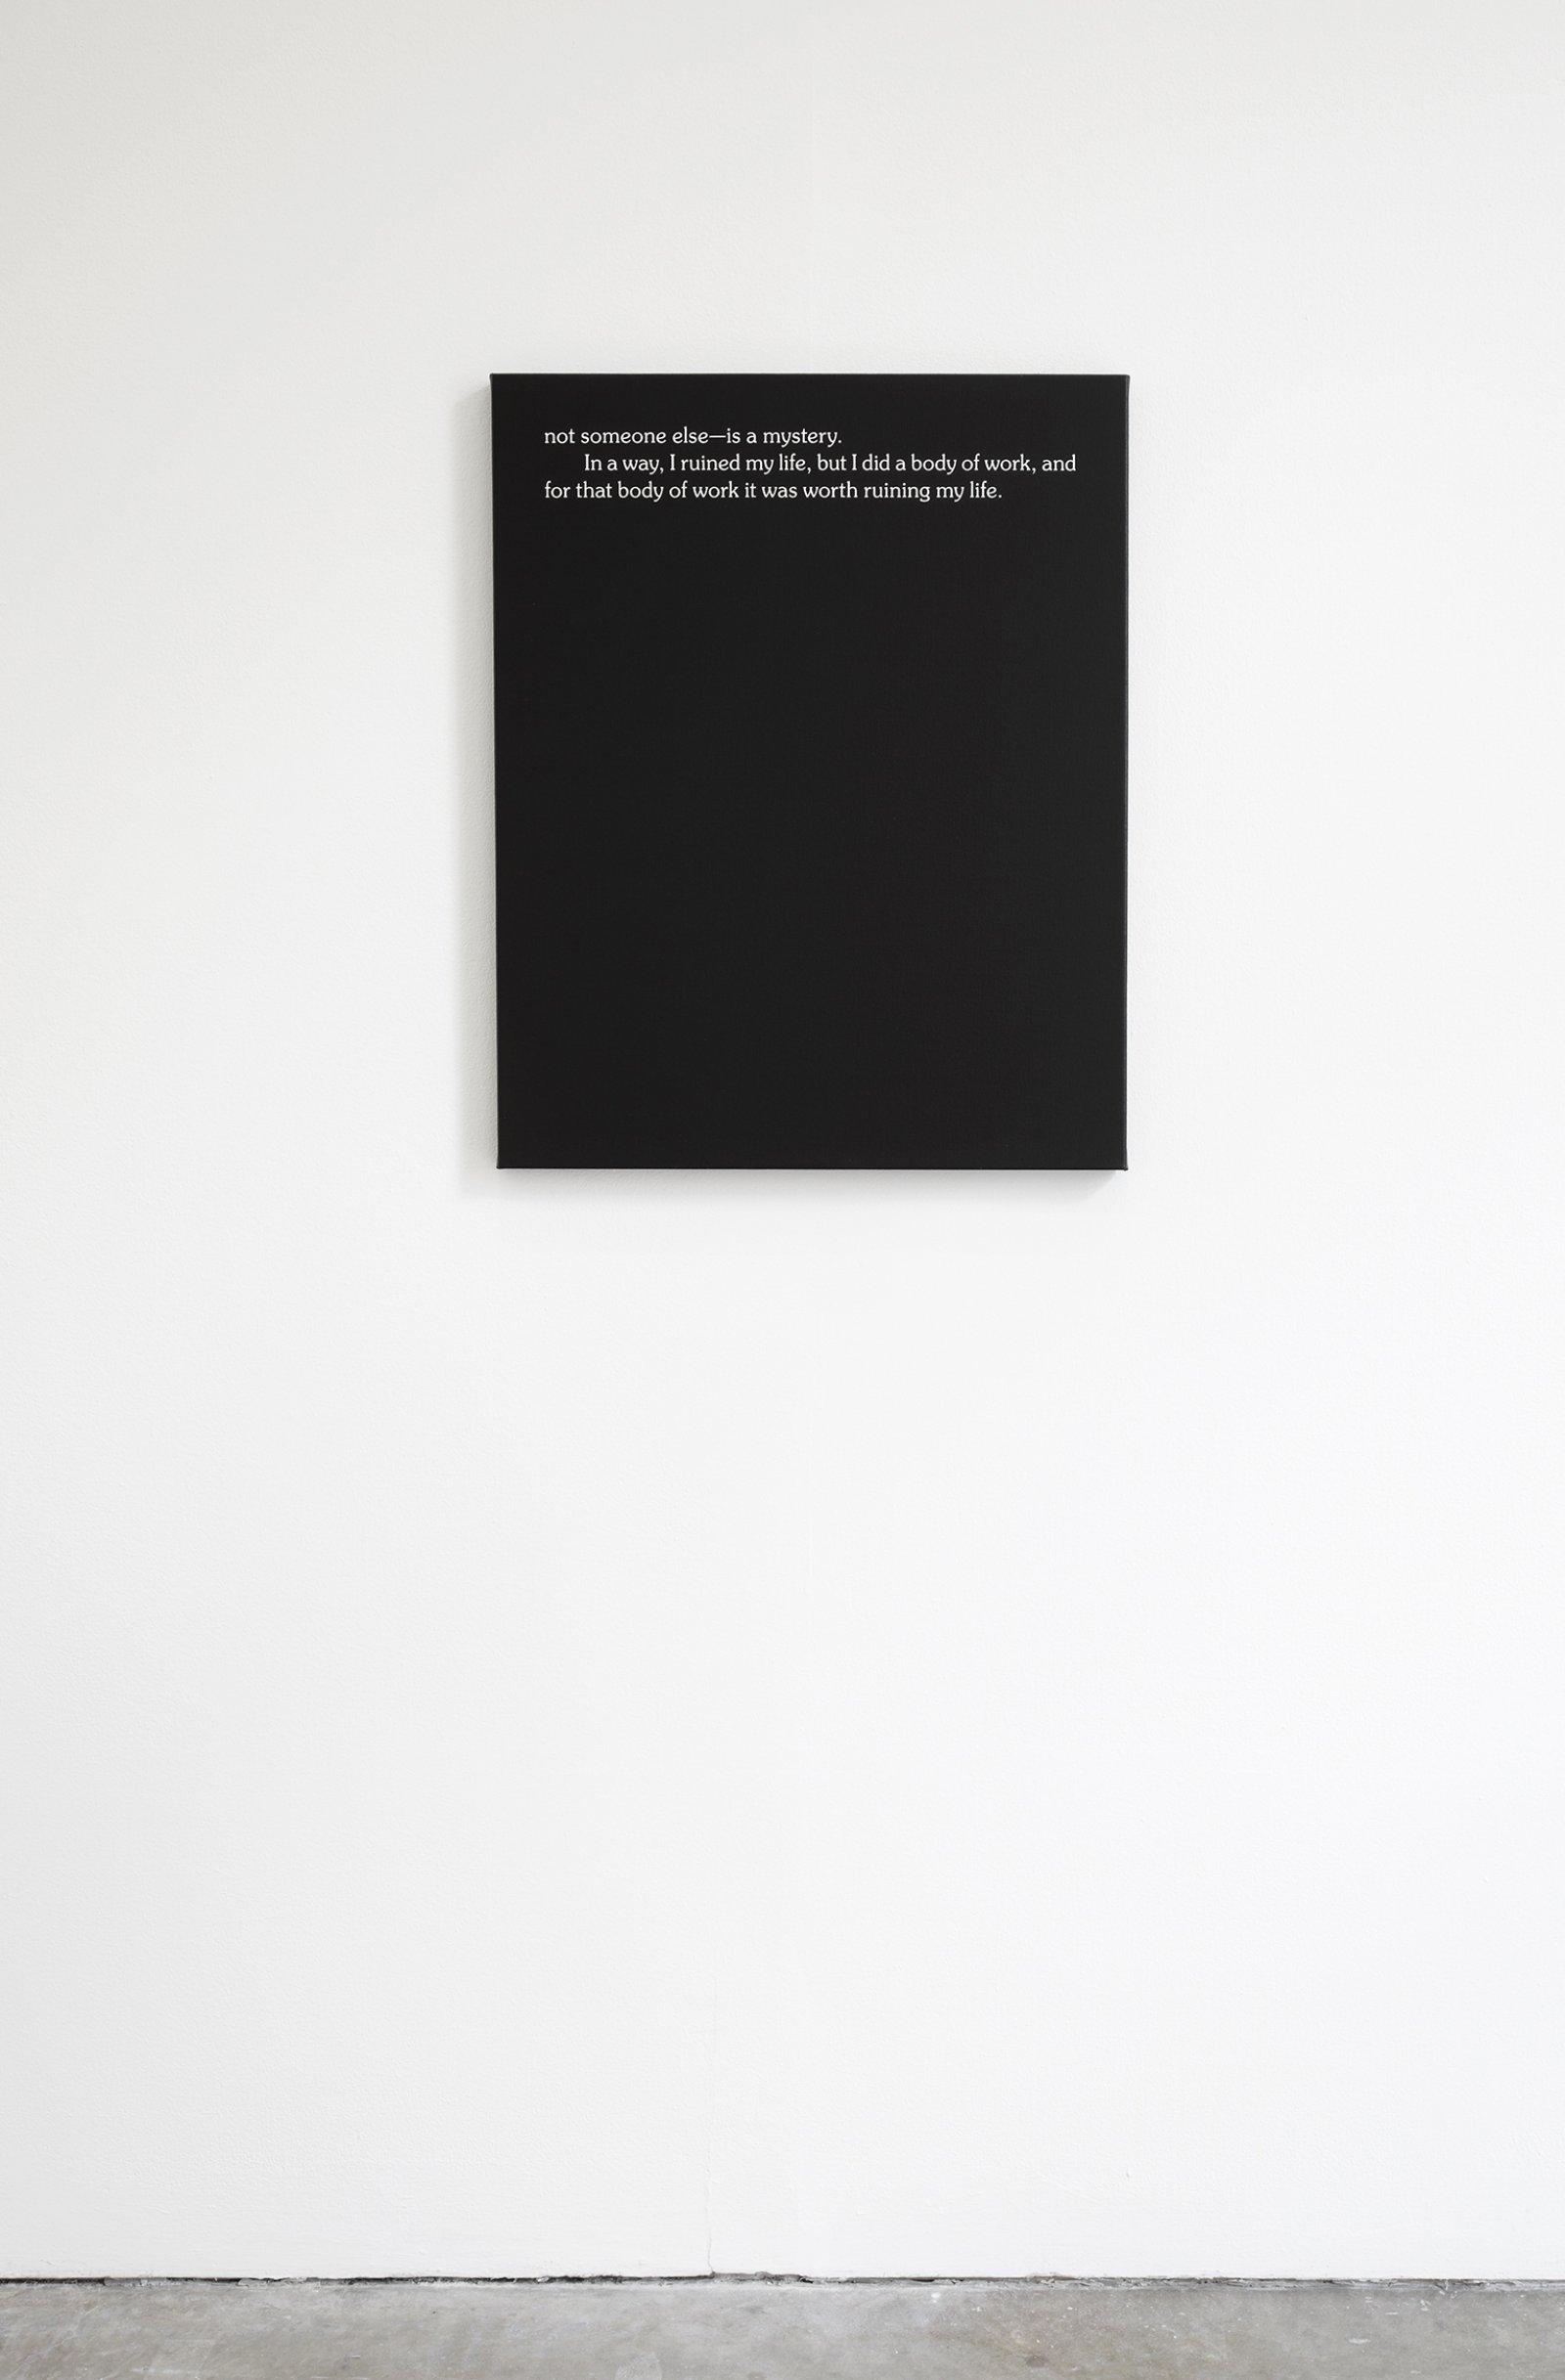 Ron Terada,Jack, 2010, acrylic on canvas, 30 x 24 in. (76 x 61 cm)